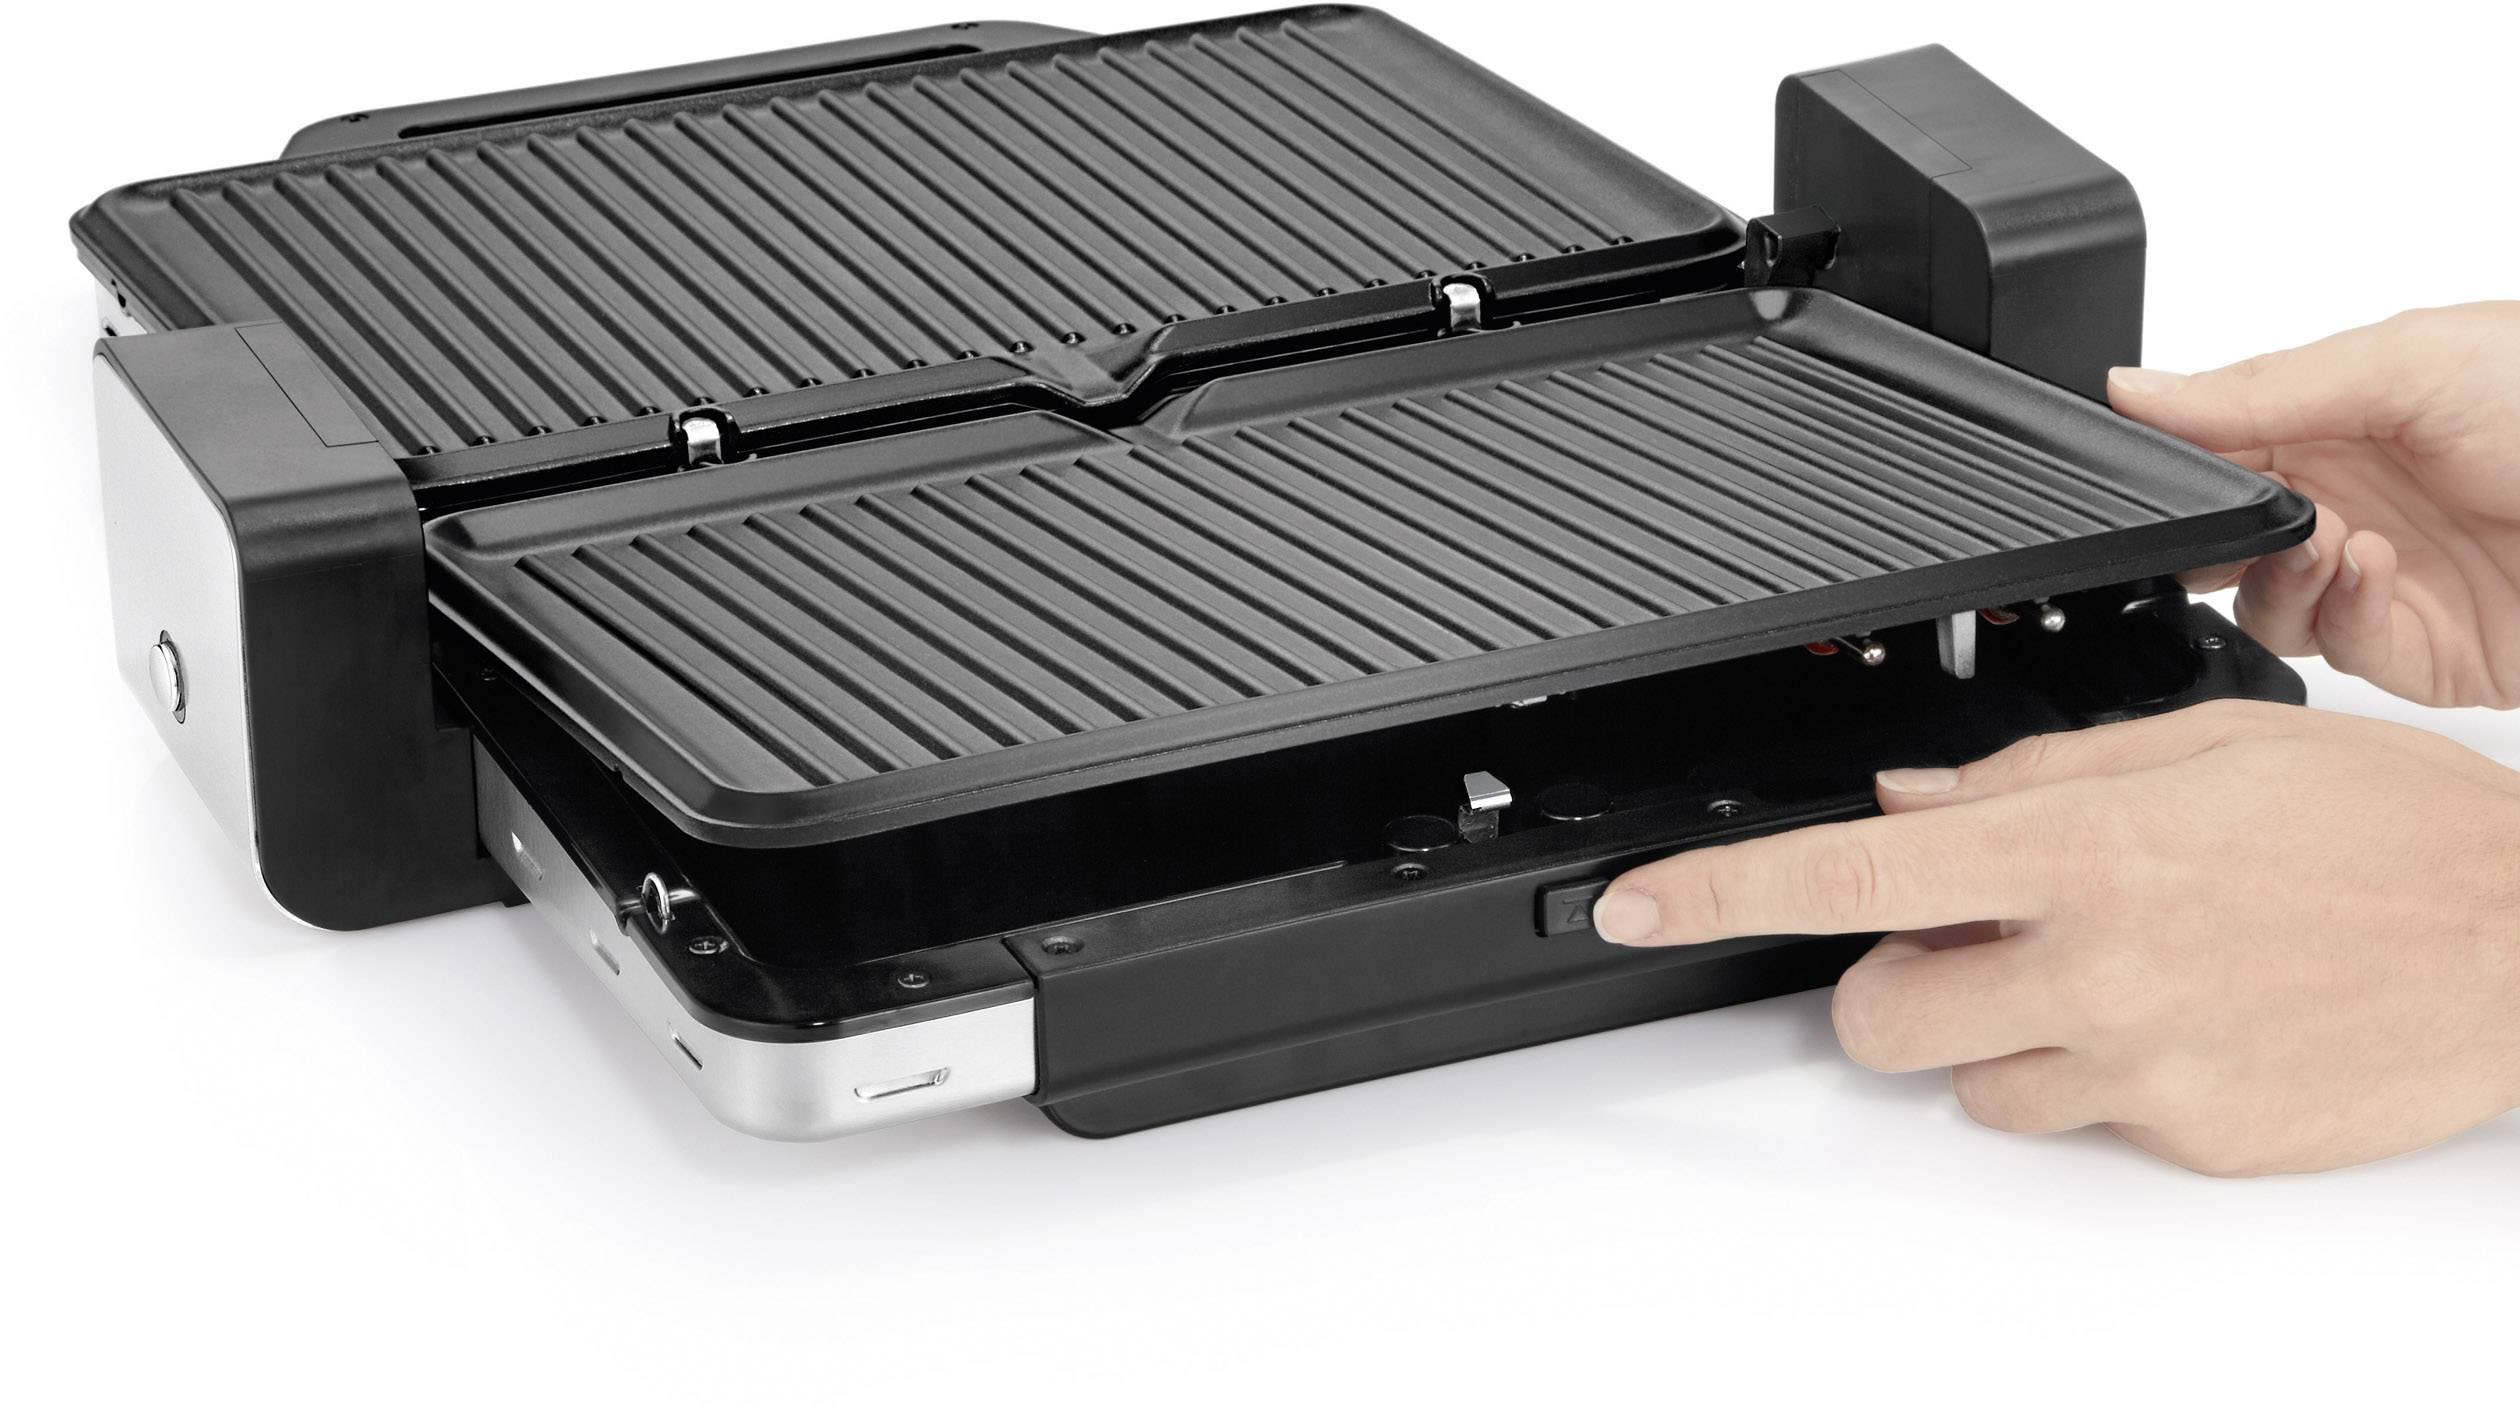 Wmf Elektrogrill Anleitung : Wmf elektro kontakt grill silber schwarz